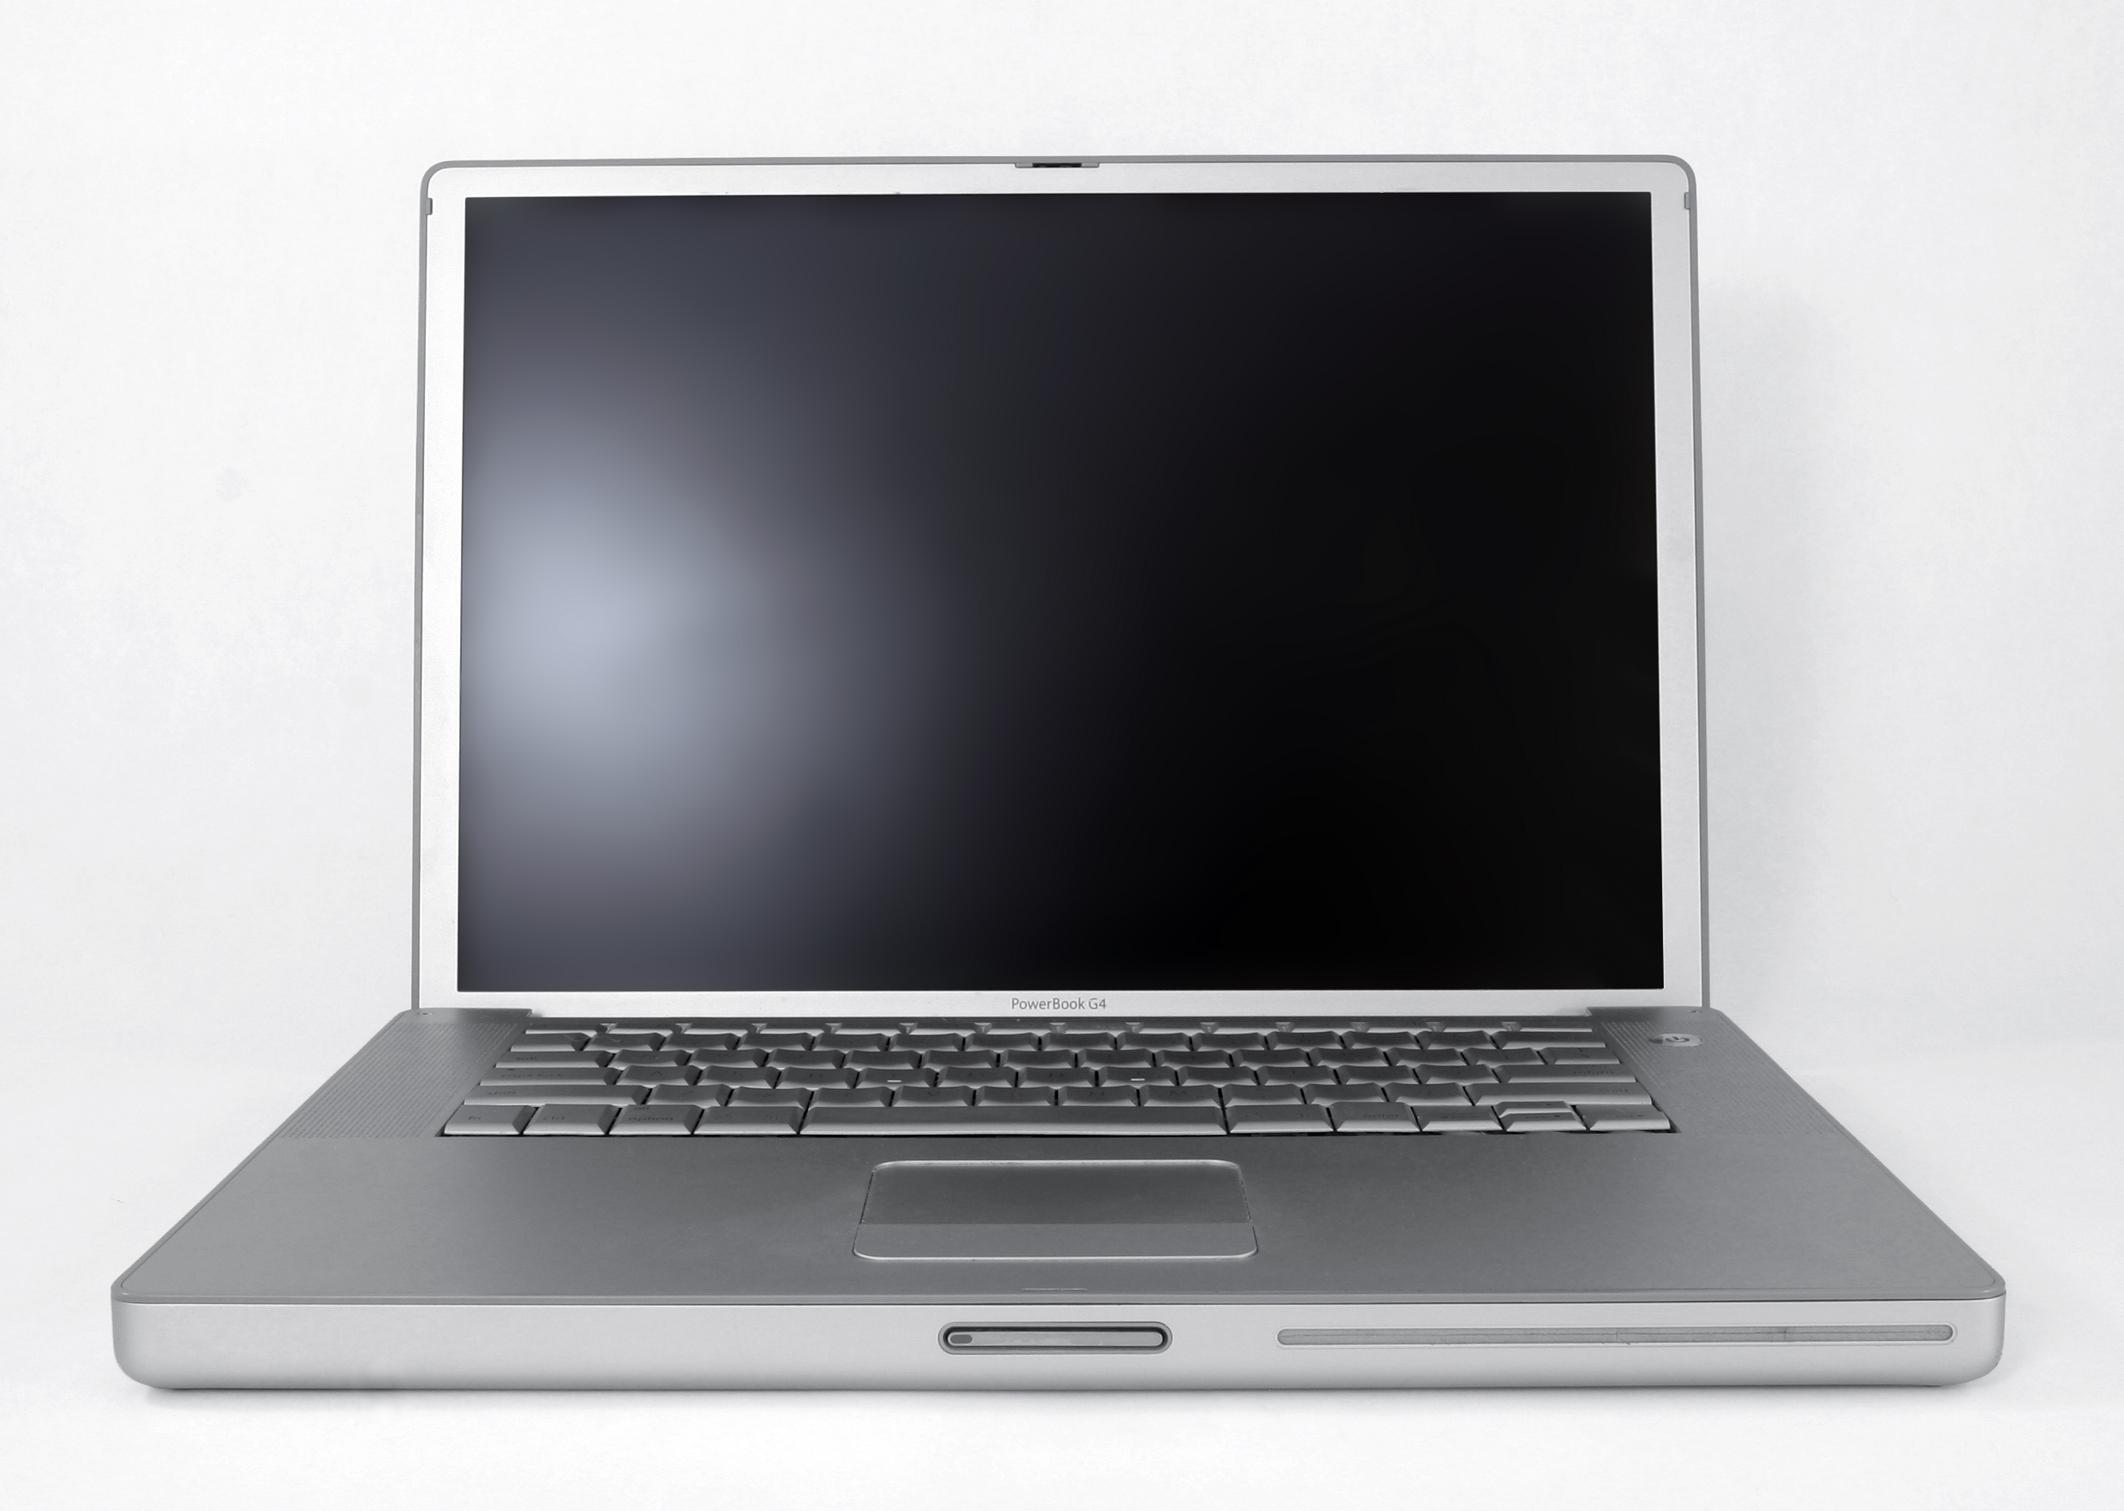 Apple PowerBook G4 Image